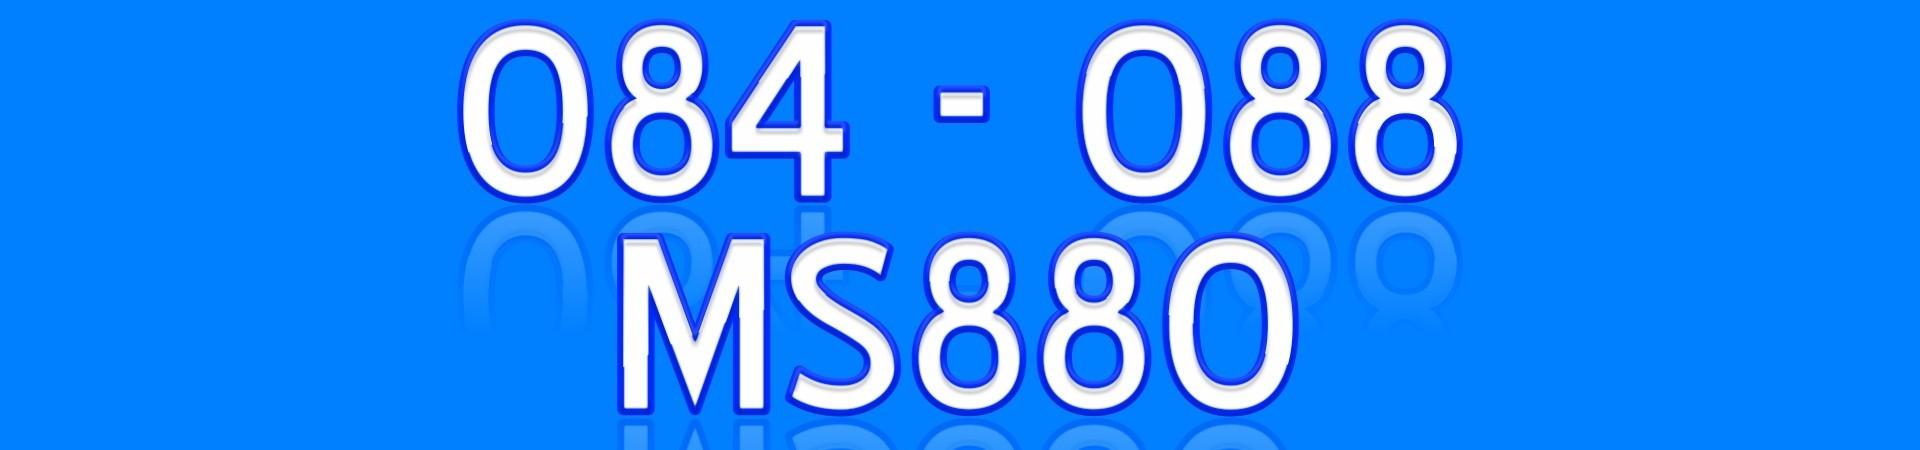 084 088 MS880